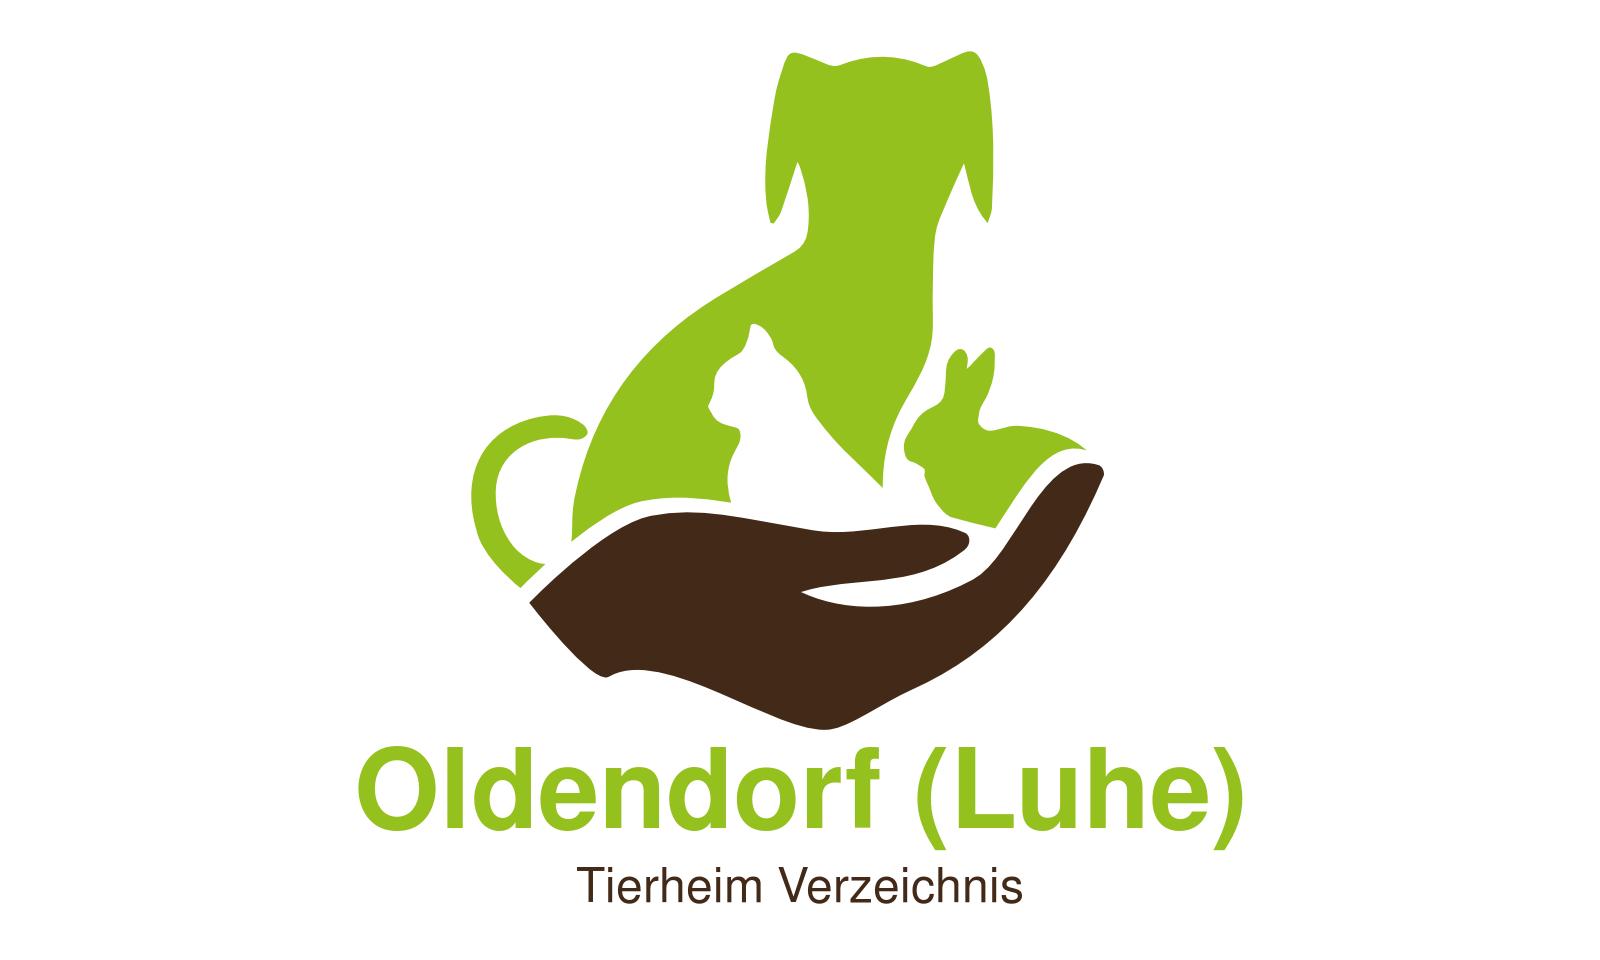 Tierheim Oldendorf (Luhe)